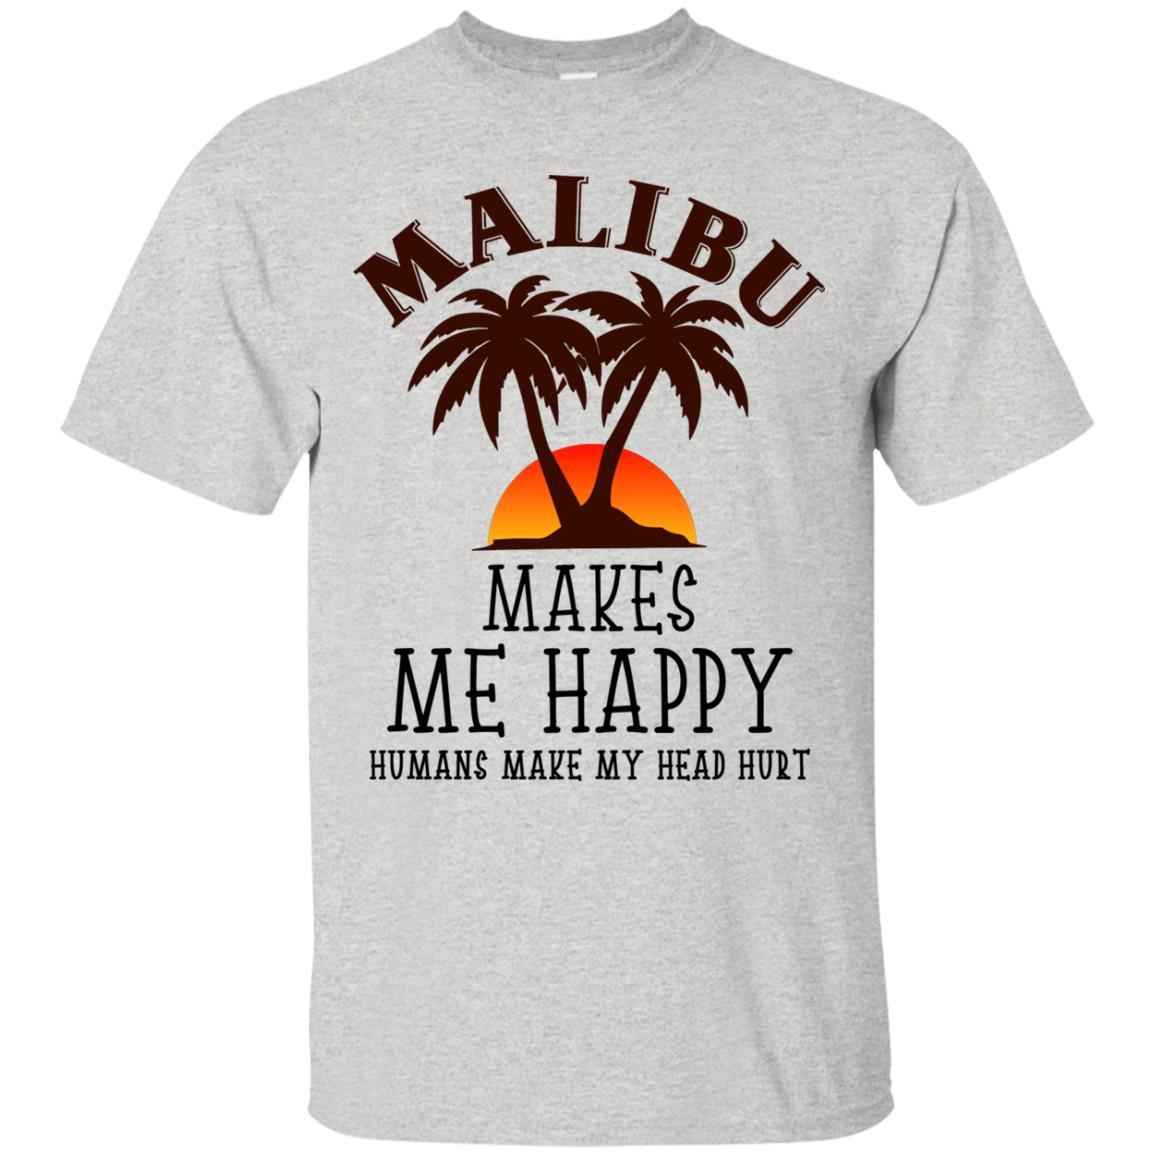 Malibu Makes Me Happy Humans Make My Head Hurt T Shirt